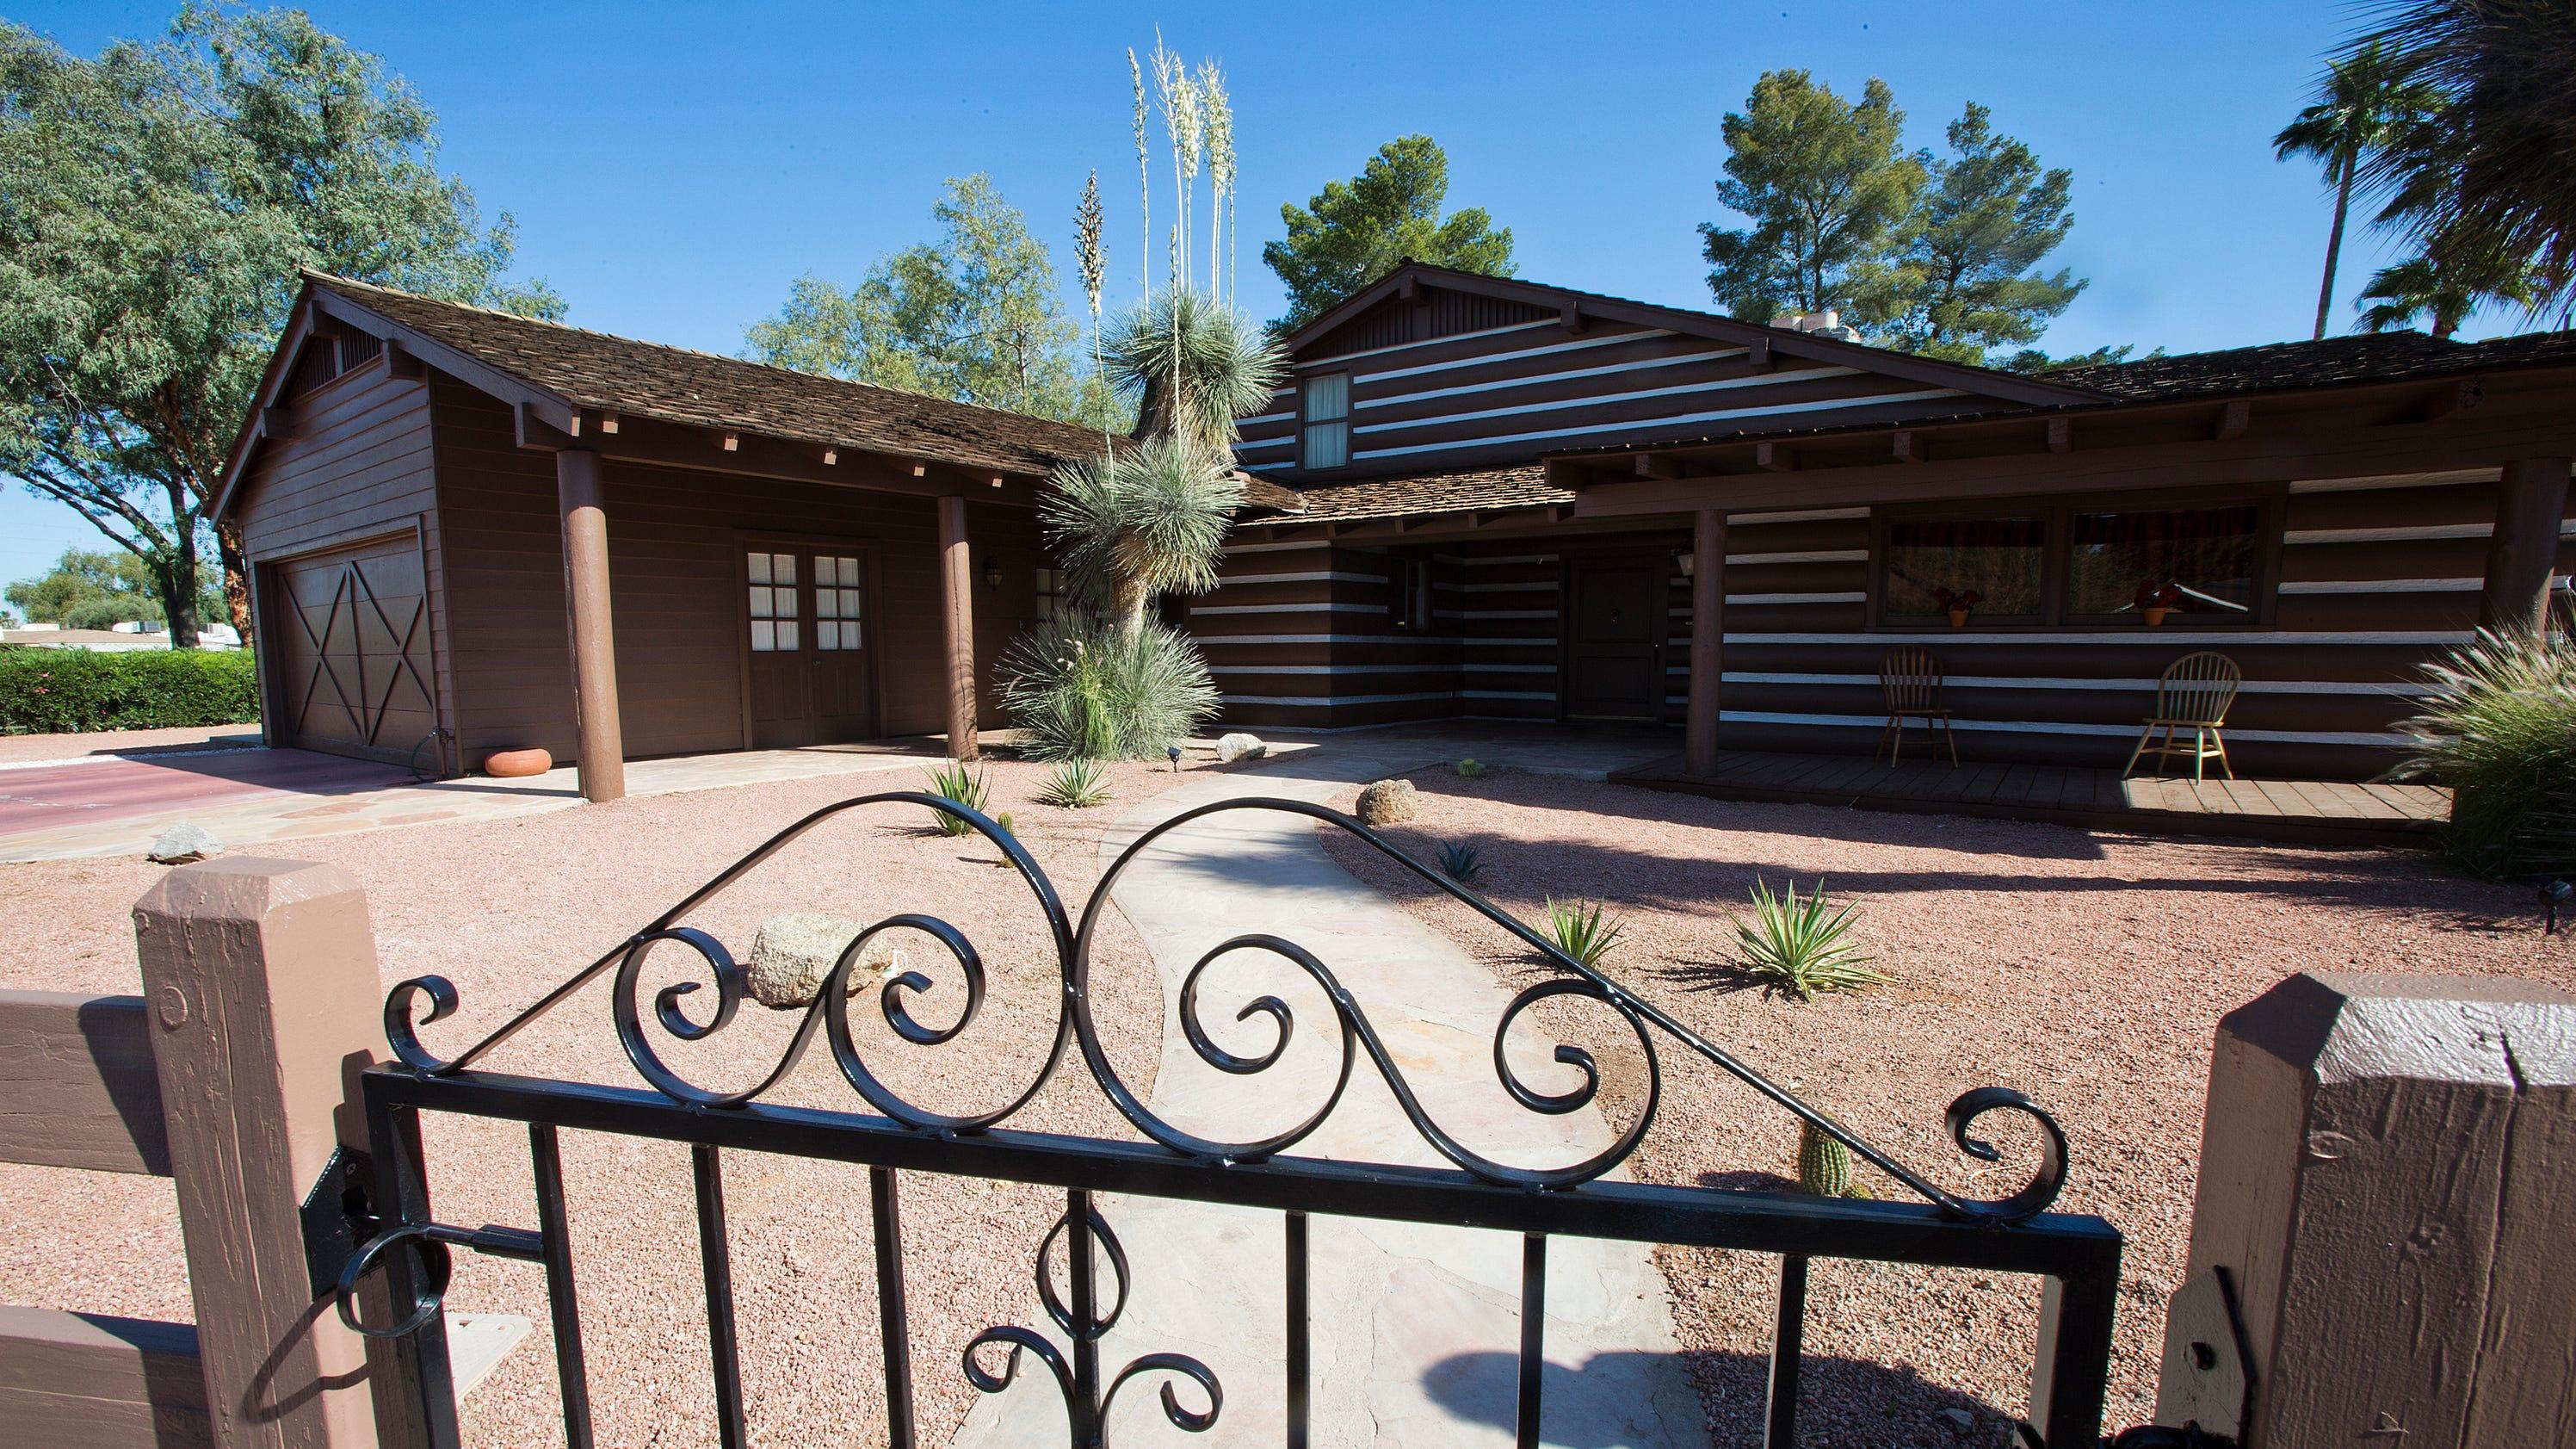 Lorne greene 39 s 39 bonanza 39 house in mesa gets historic for Ponderosa ranch house floor plan